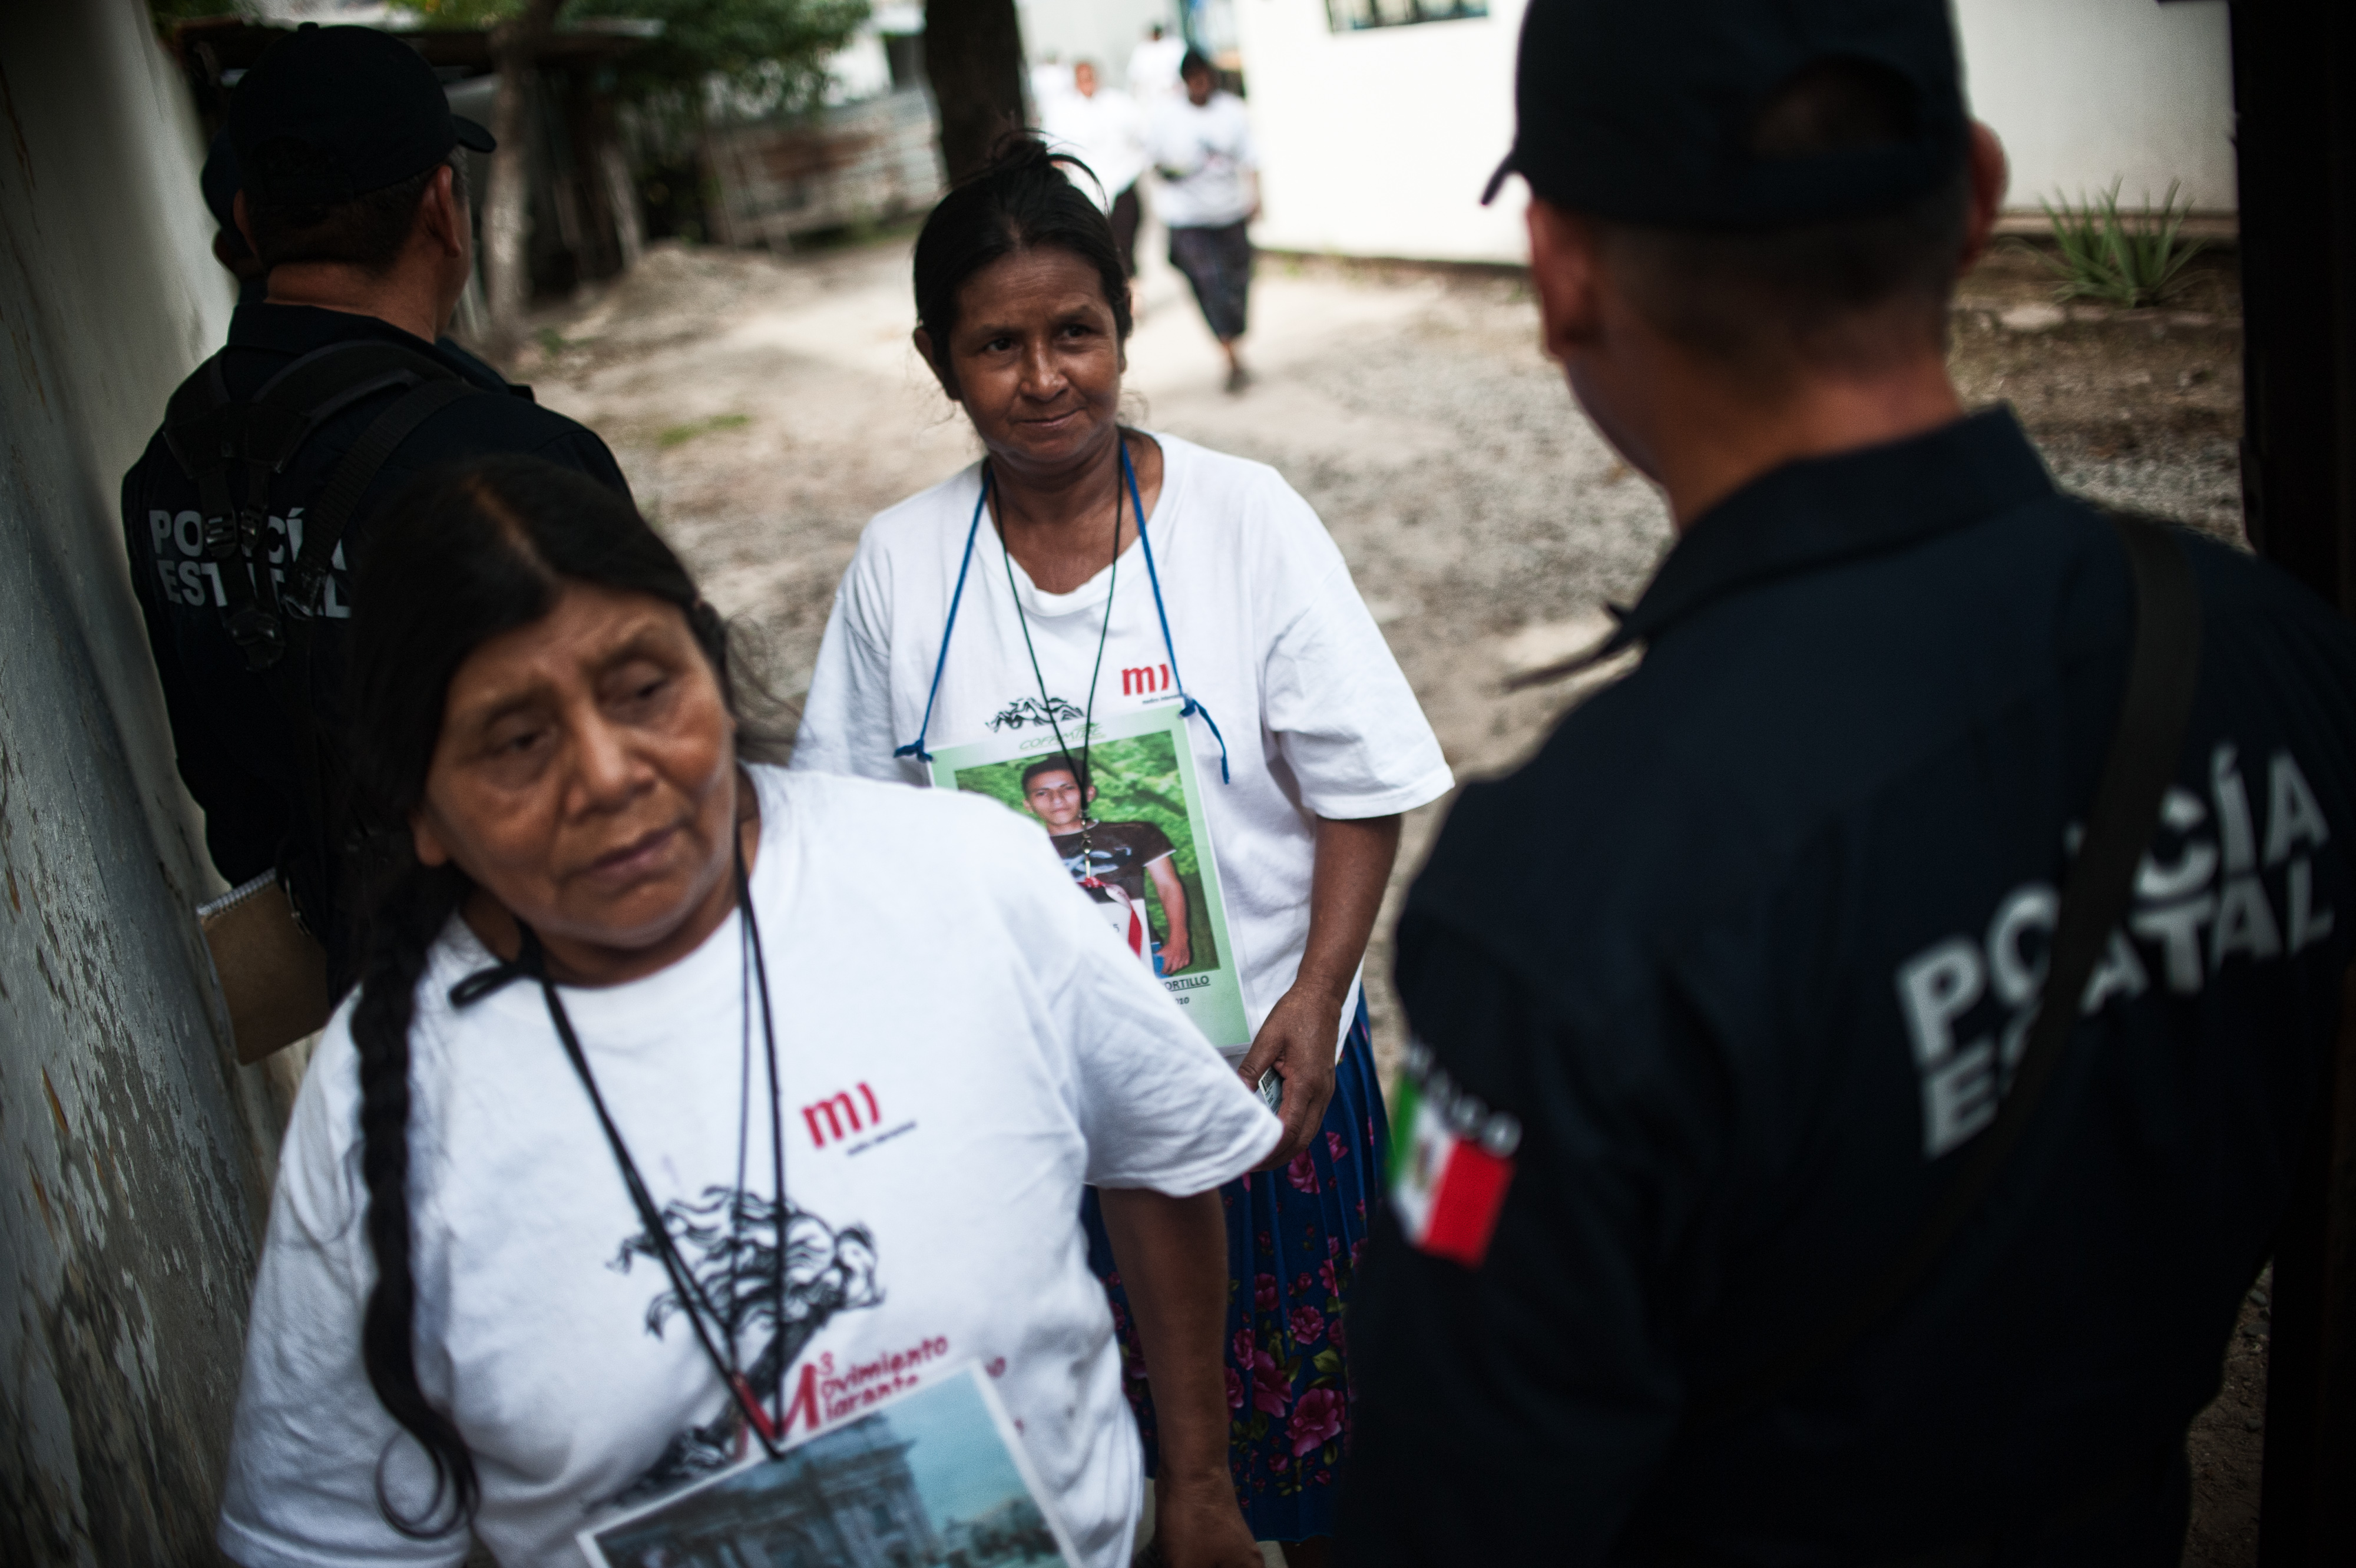 https://caravanademadres.files.wordpress.com/2015/12/caravana-de-madres-de-migrantes-b-oaxaca-2.jpg